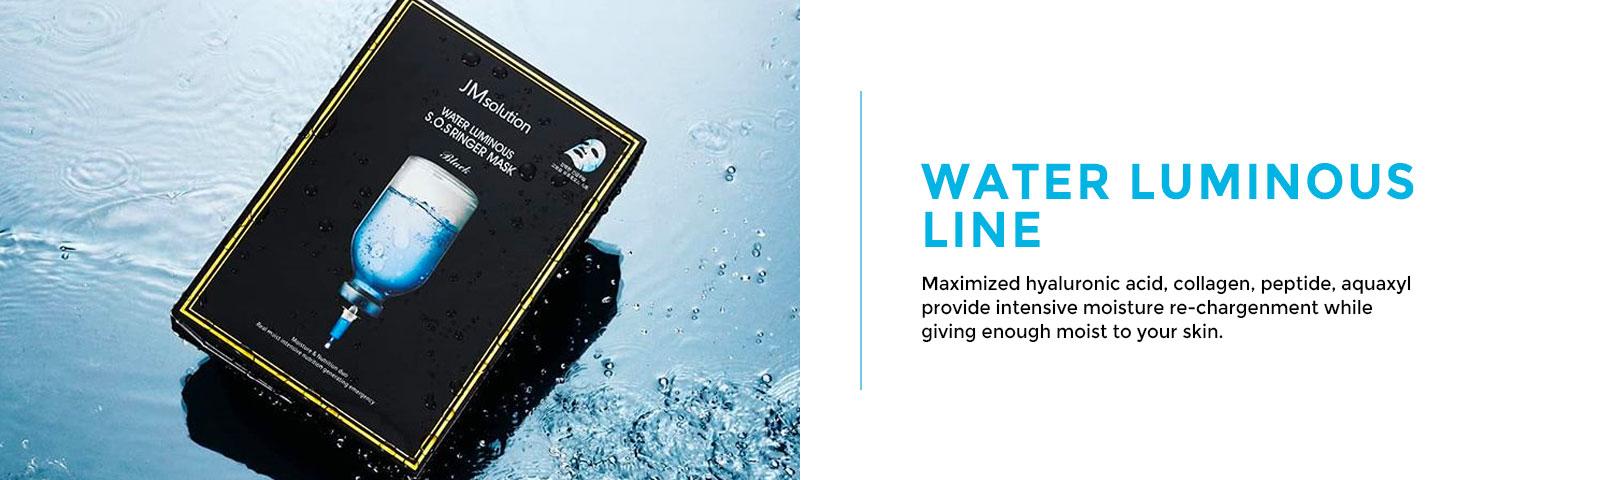 subline banner water luminous JMsolution